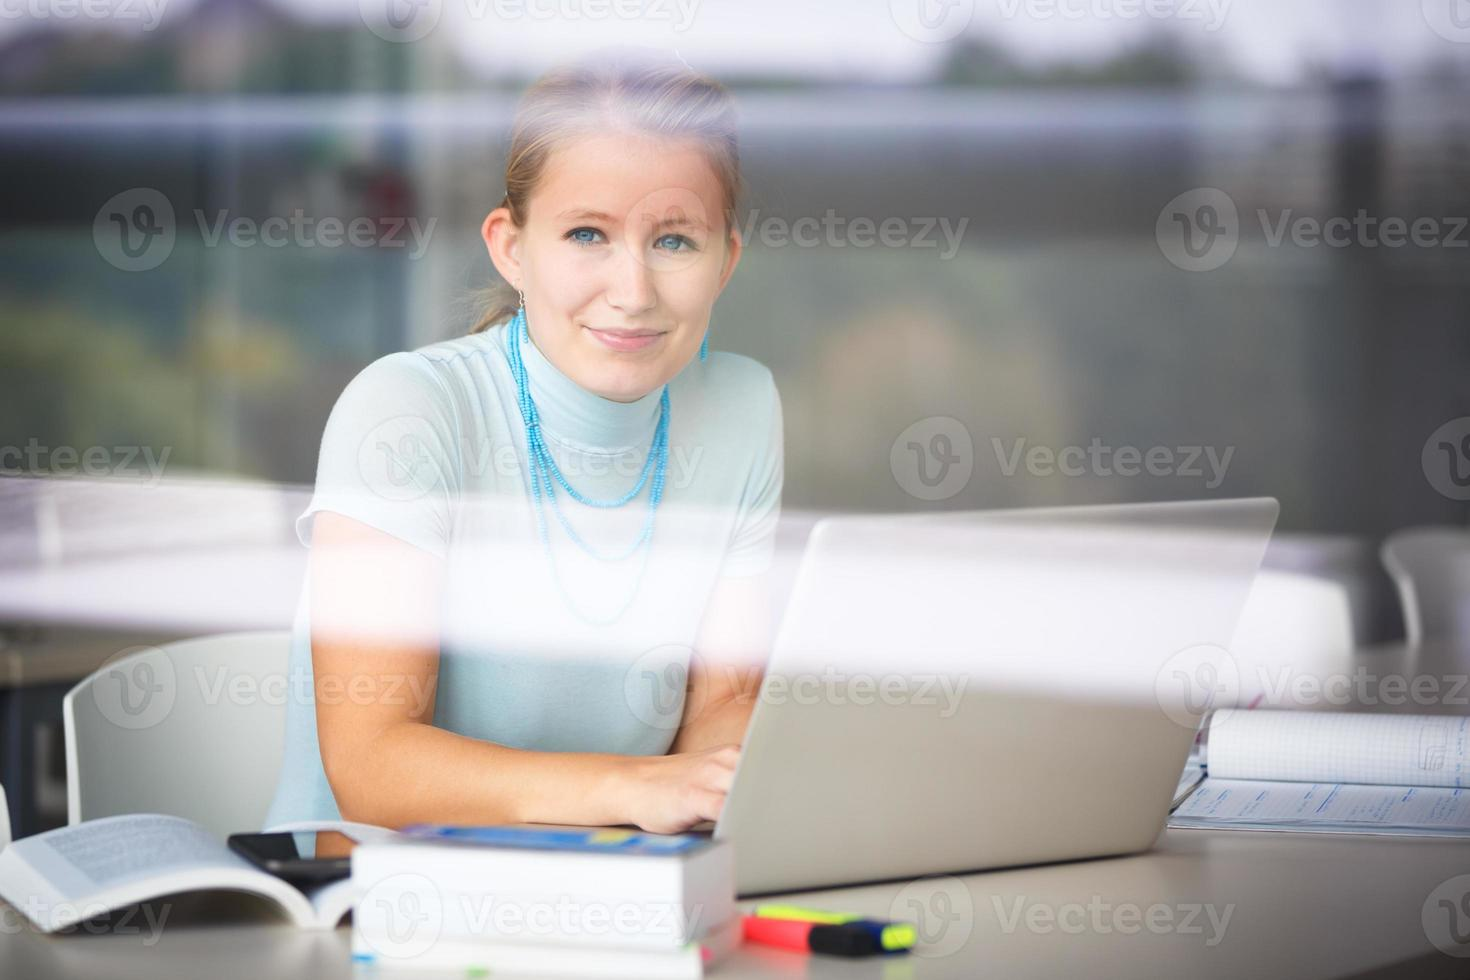 vacker, kvinnlig student i ett gymnasialbibliotek foto